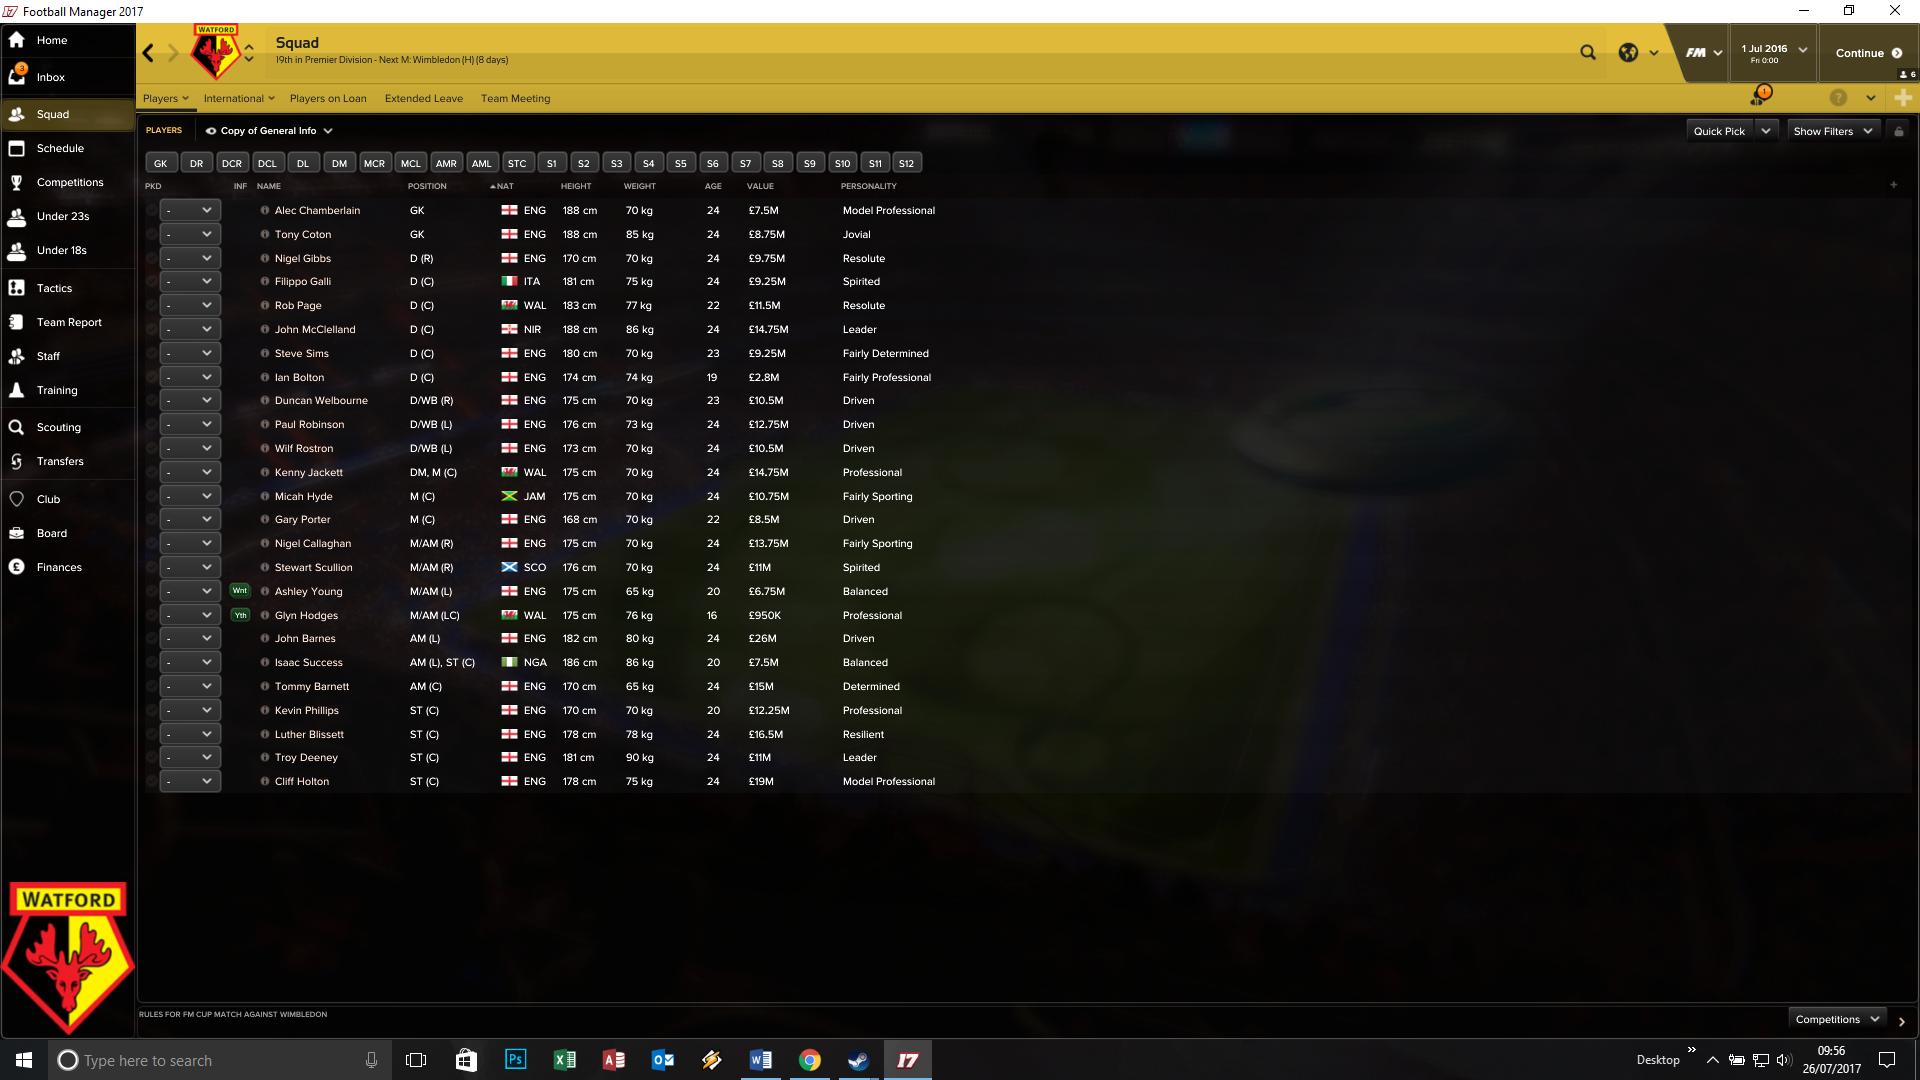 Watford_Squad.png